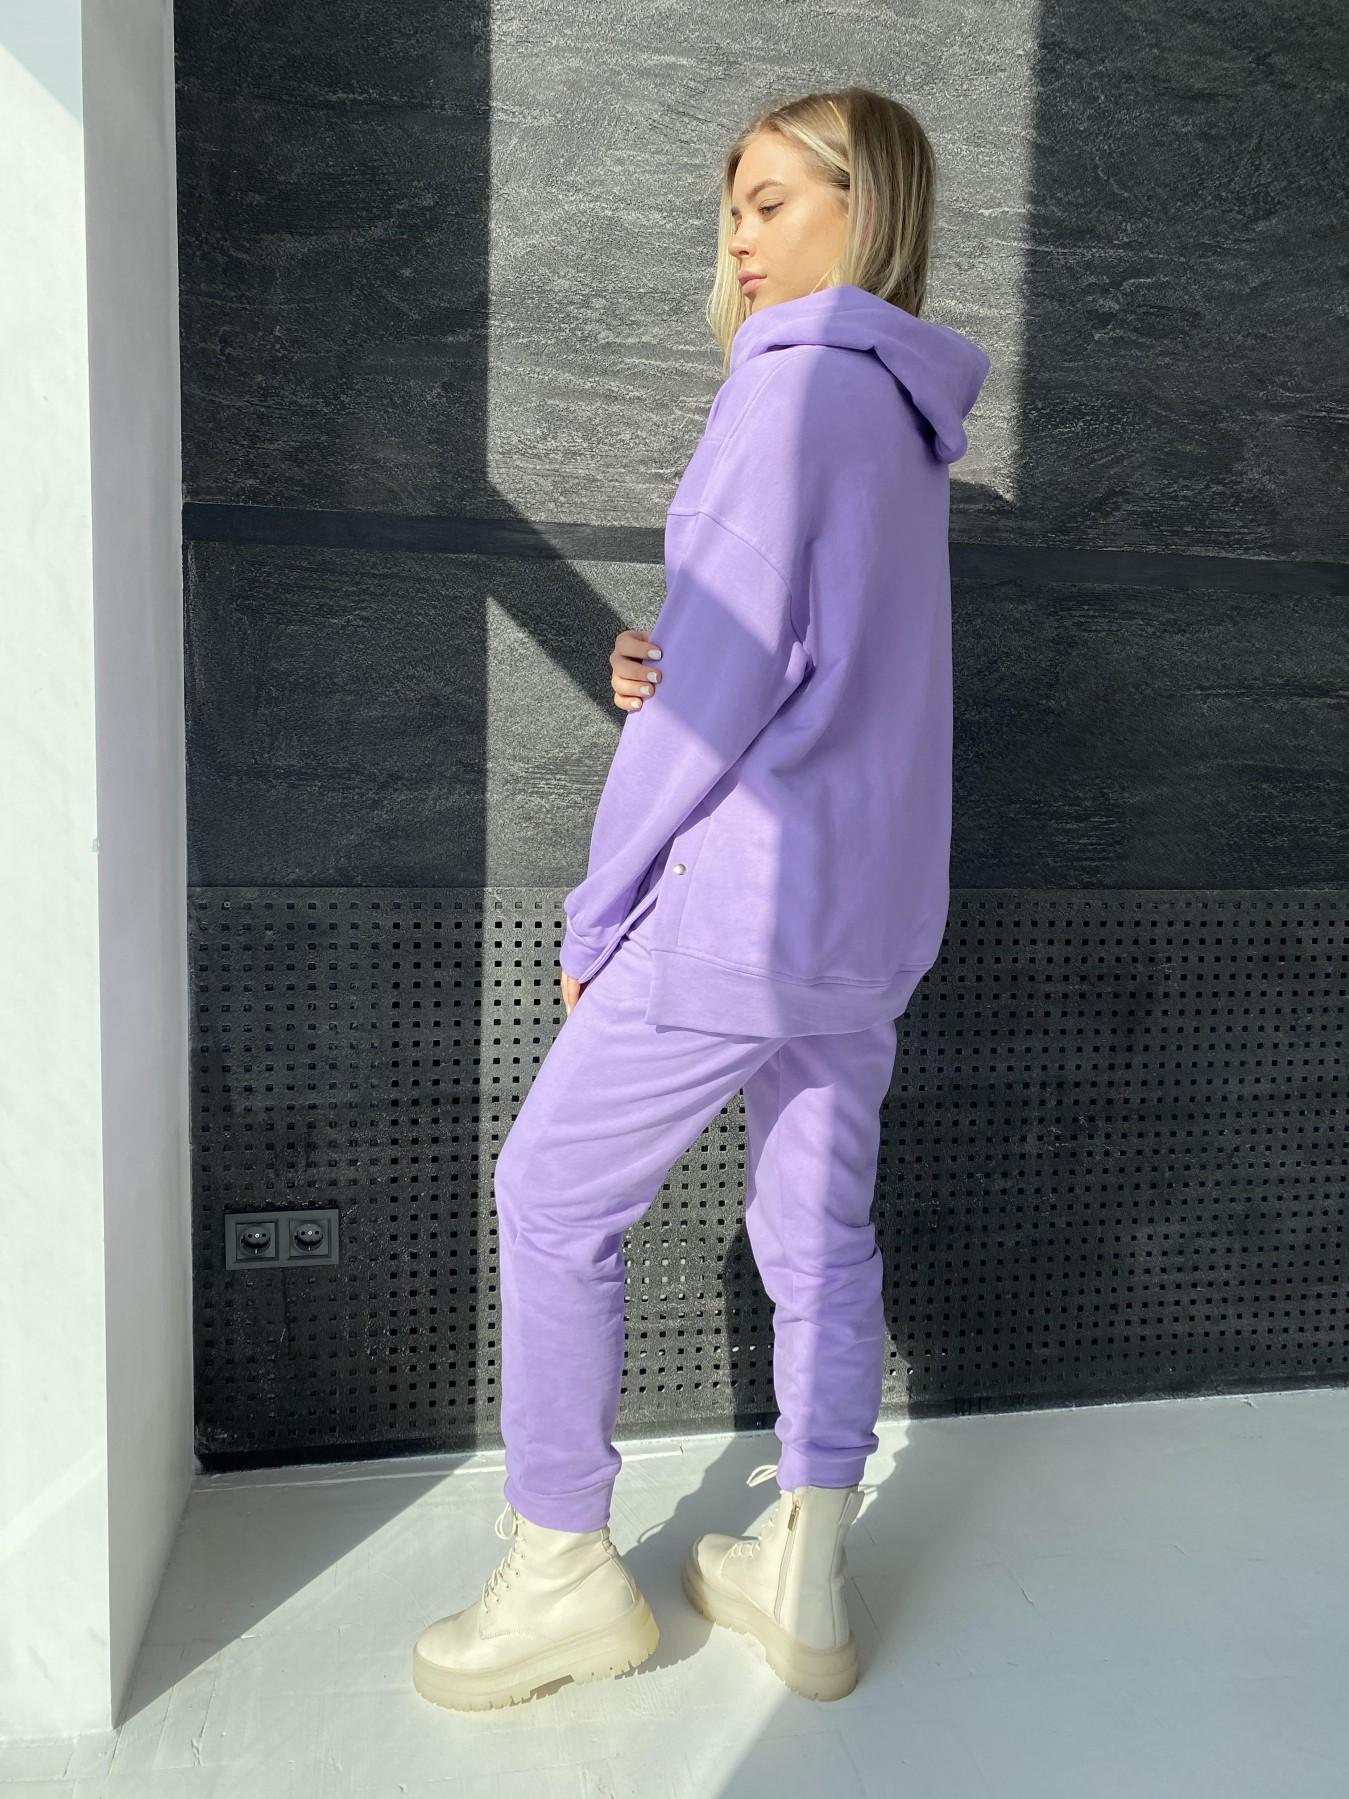 Лайф костюм  из 3х нитки 10782 АРТ. 47258 Цвет: Лаванда - фото 6, интернет магазин tm-modus.ru